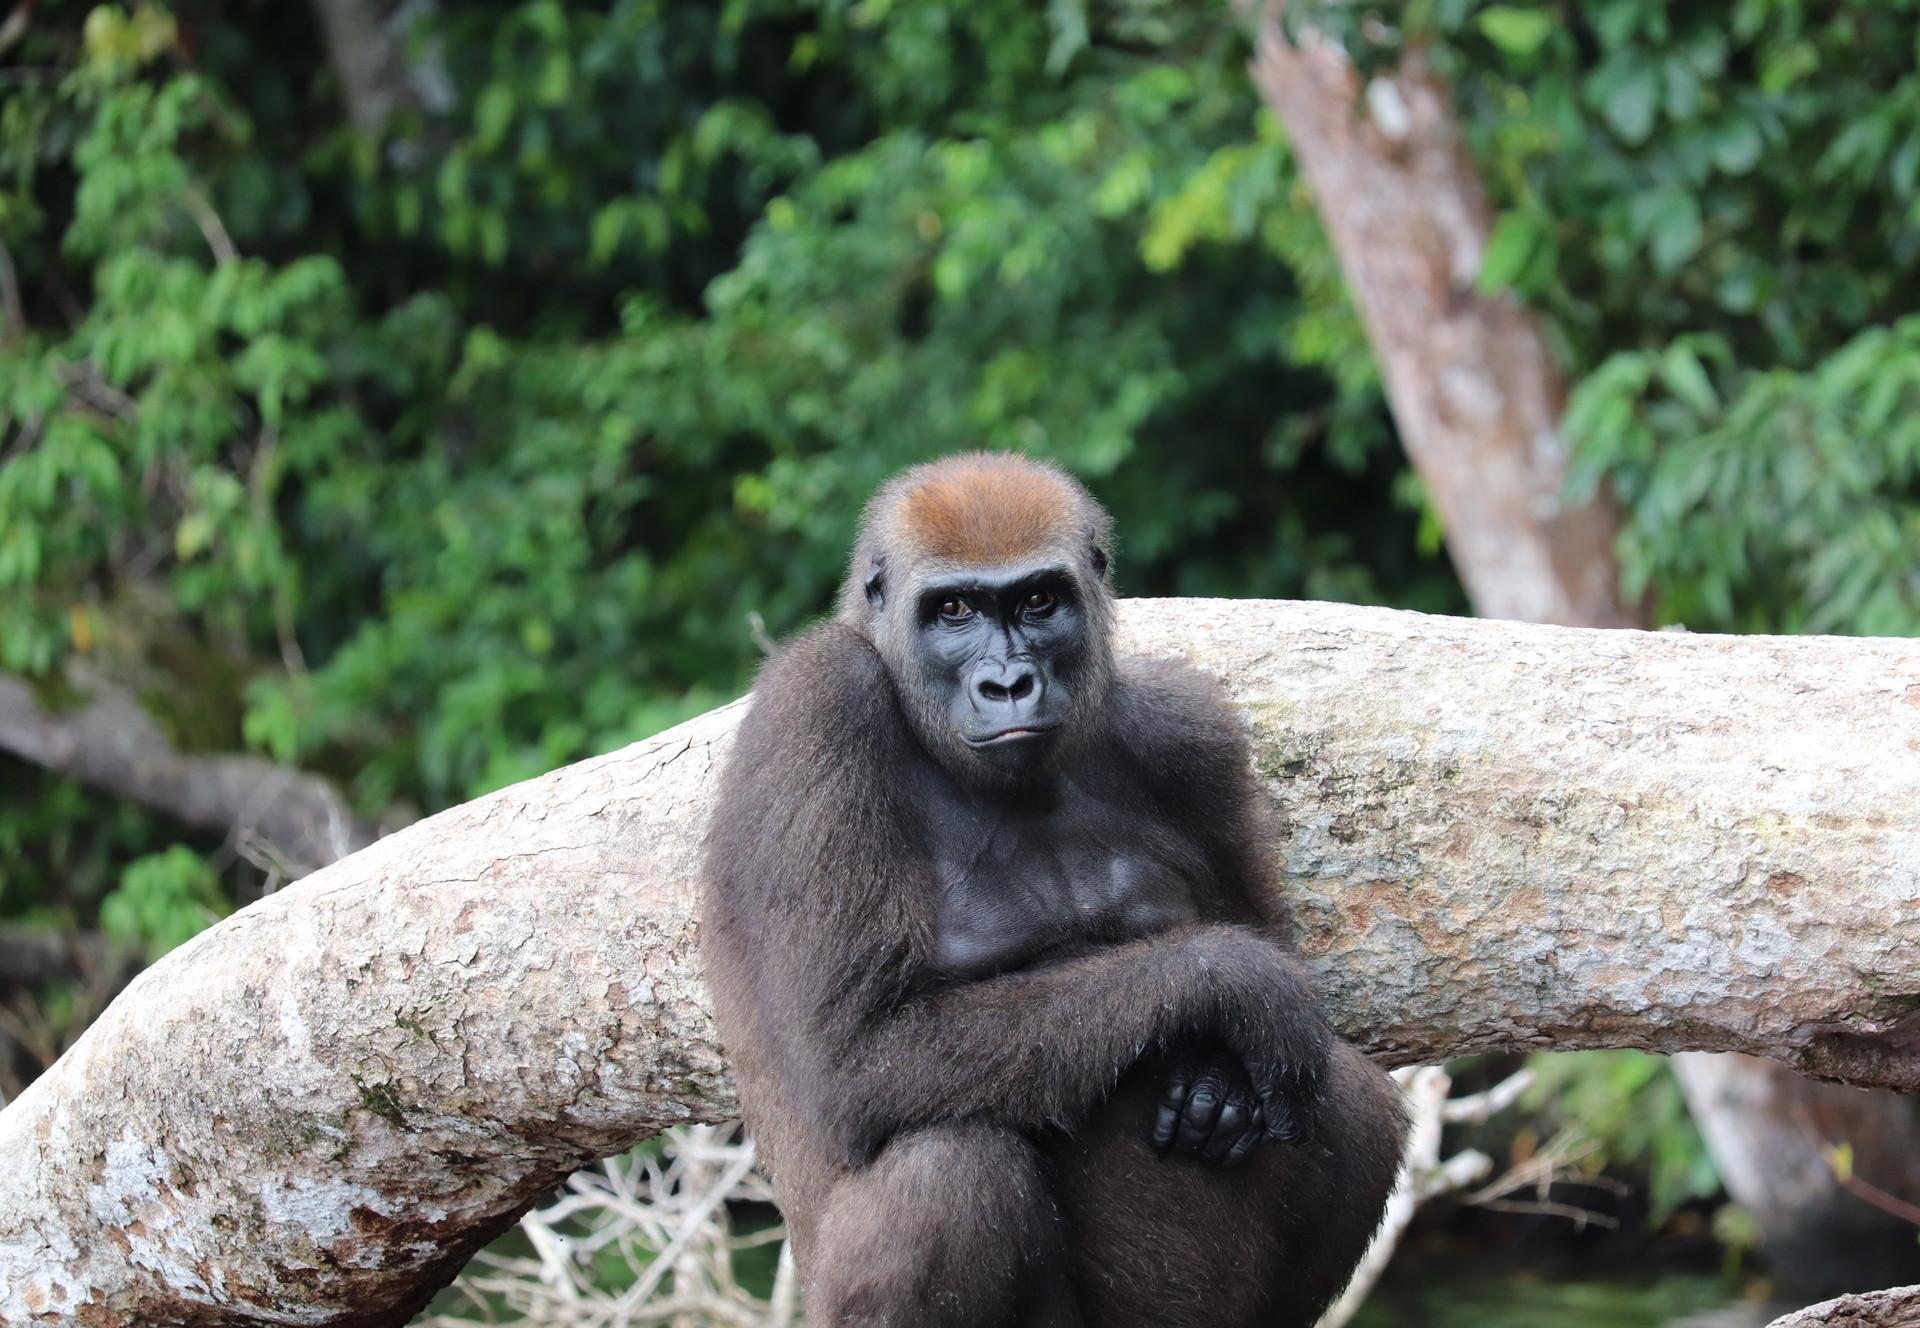 Female gorilla sitting on a stone